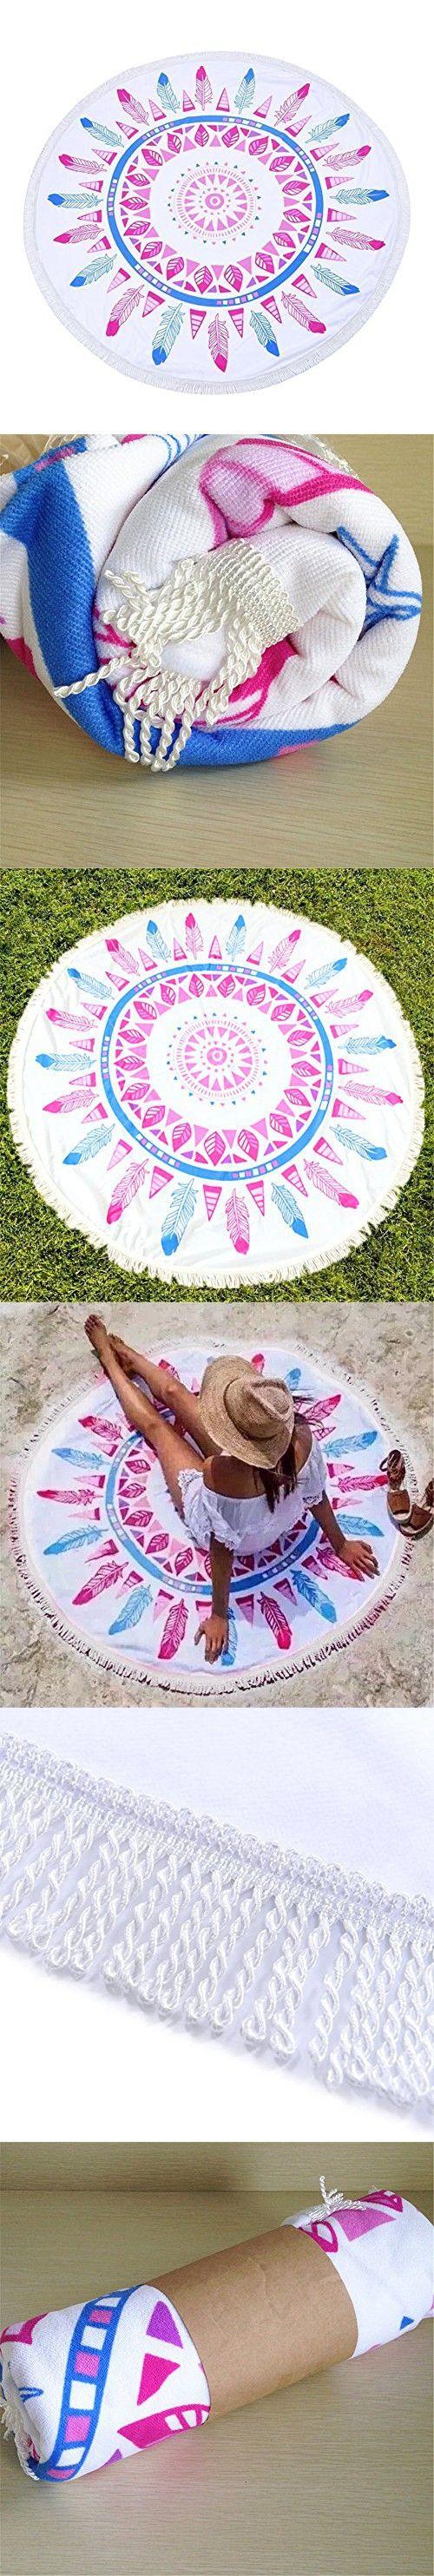 Beach Towel Round Yoga Mat Missingift Beach Throw Round Thick Table Cover Tapestry Hippy Boho Gypsy Mandala Tablecloth Picnic Roundies Shawl (Pink)